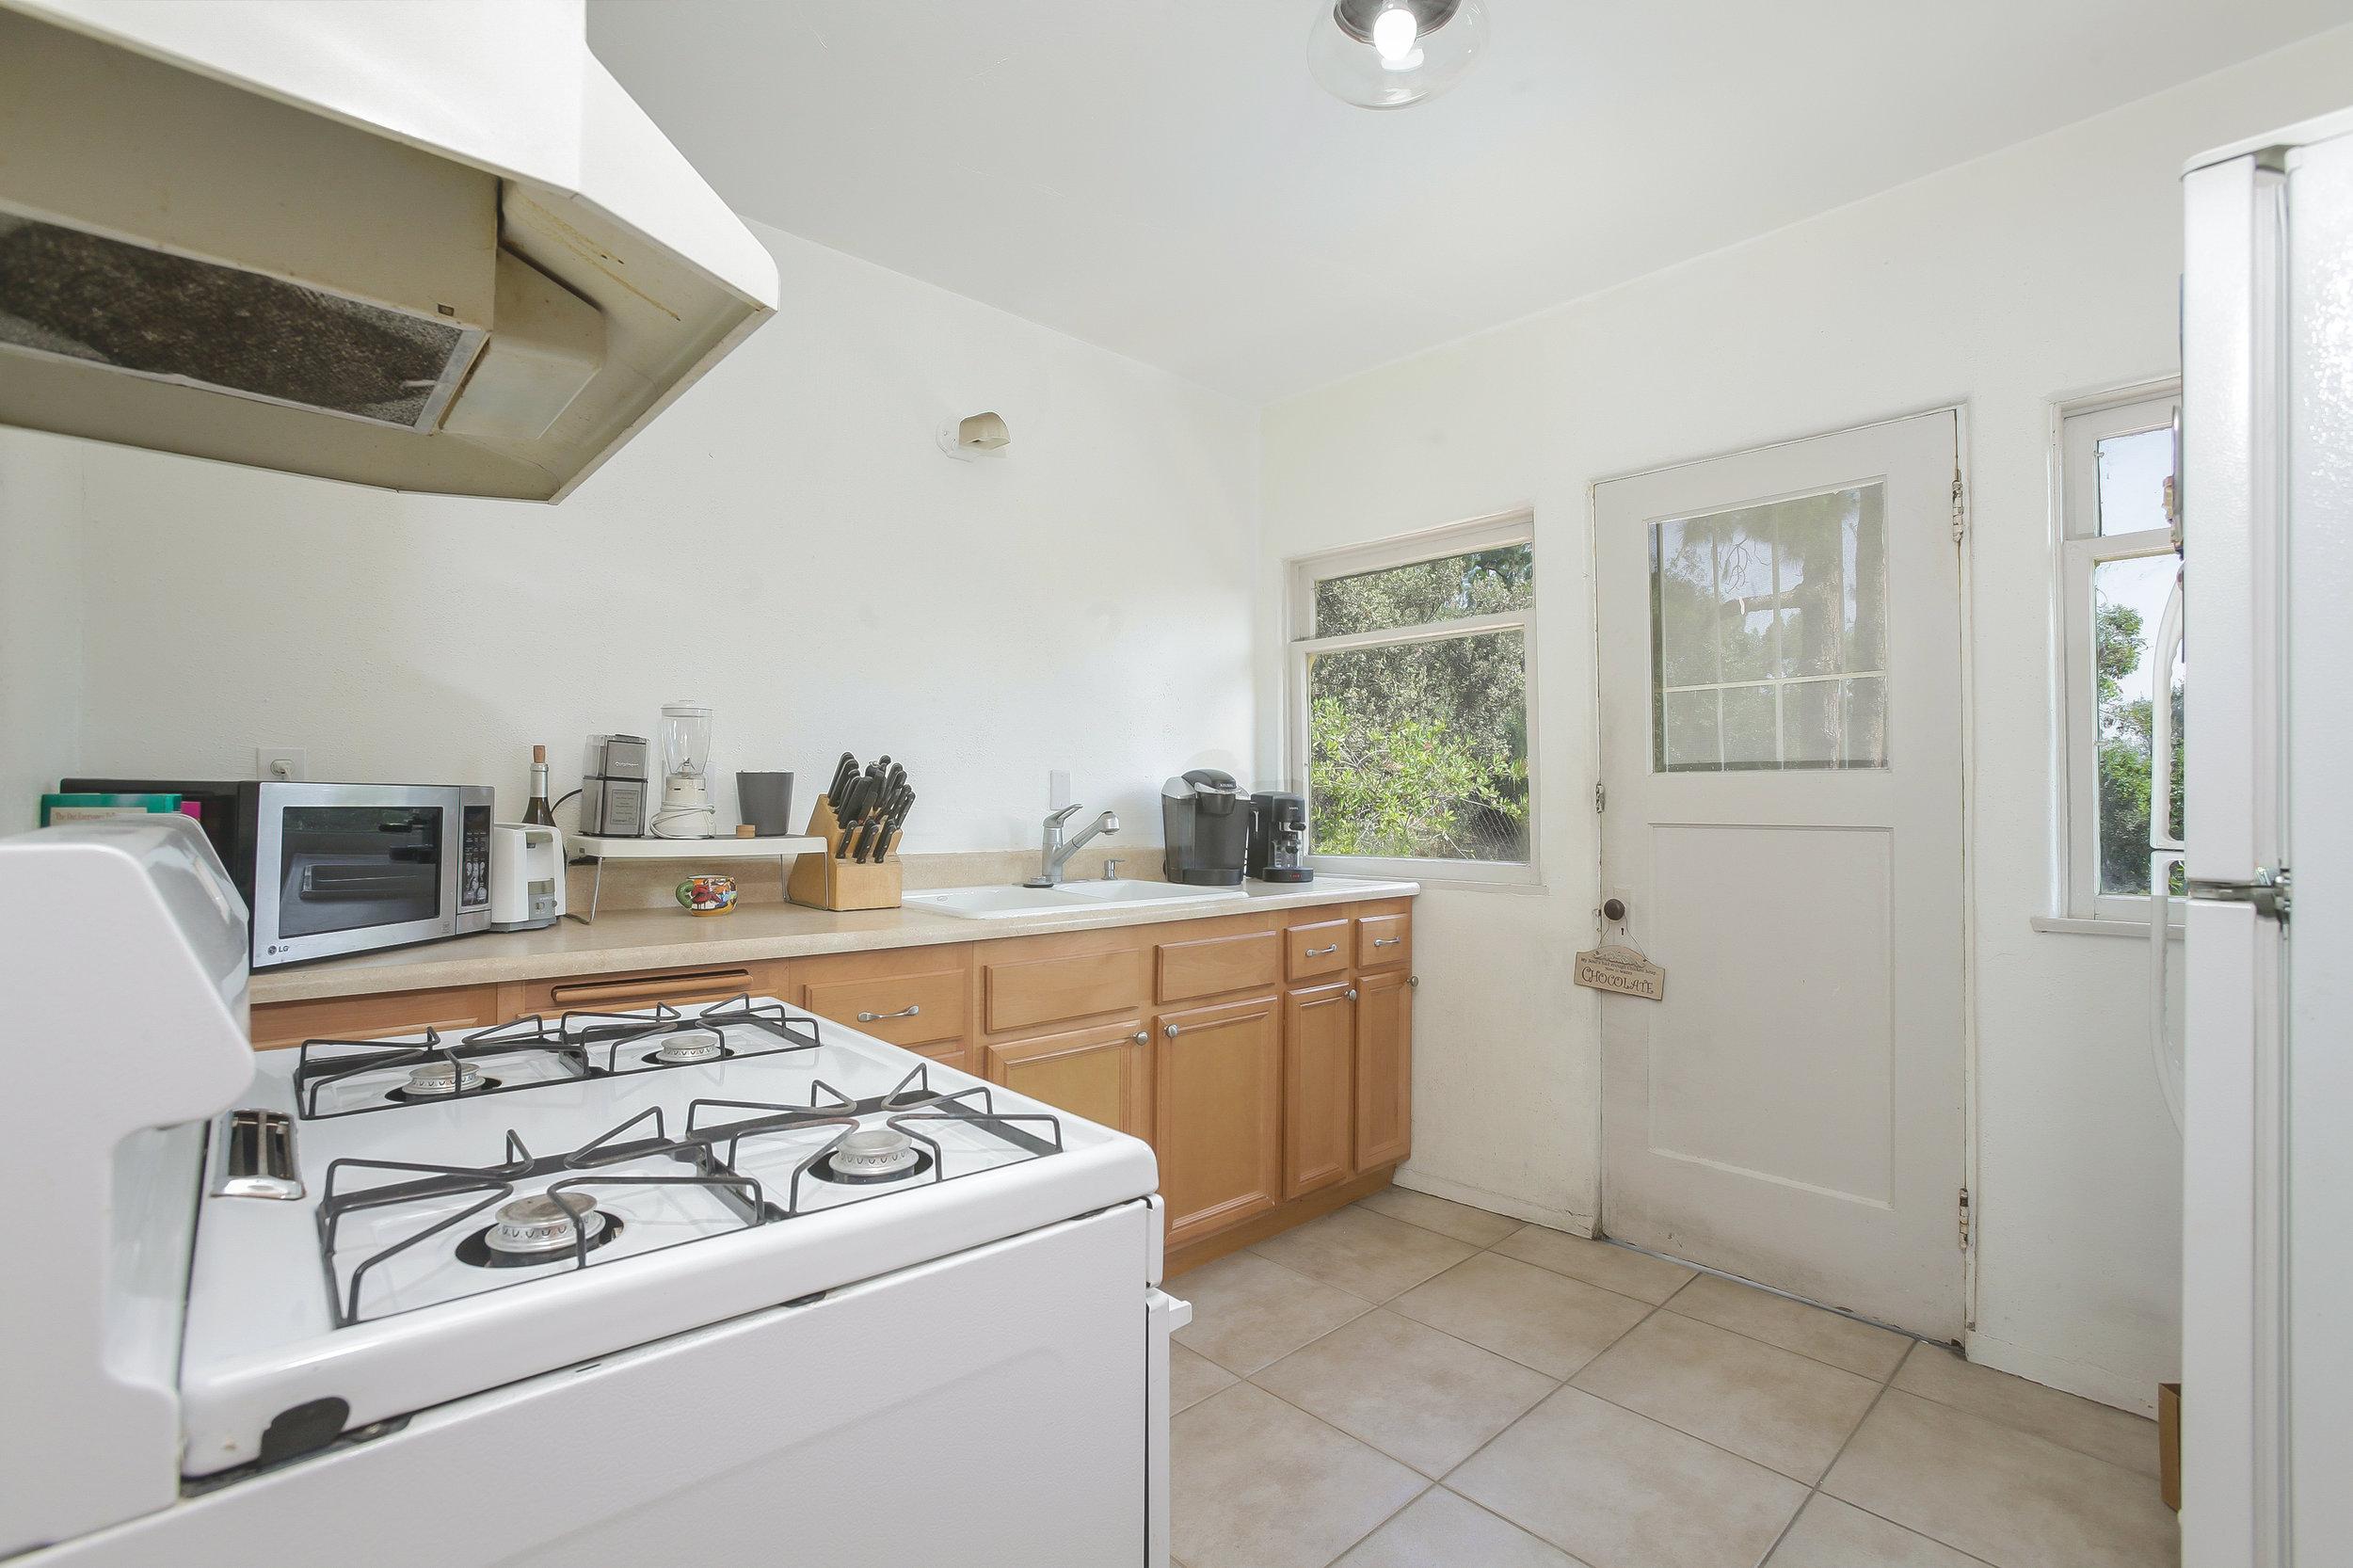 029-Kitchen-4526147-large.jpg